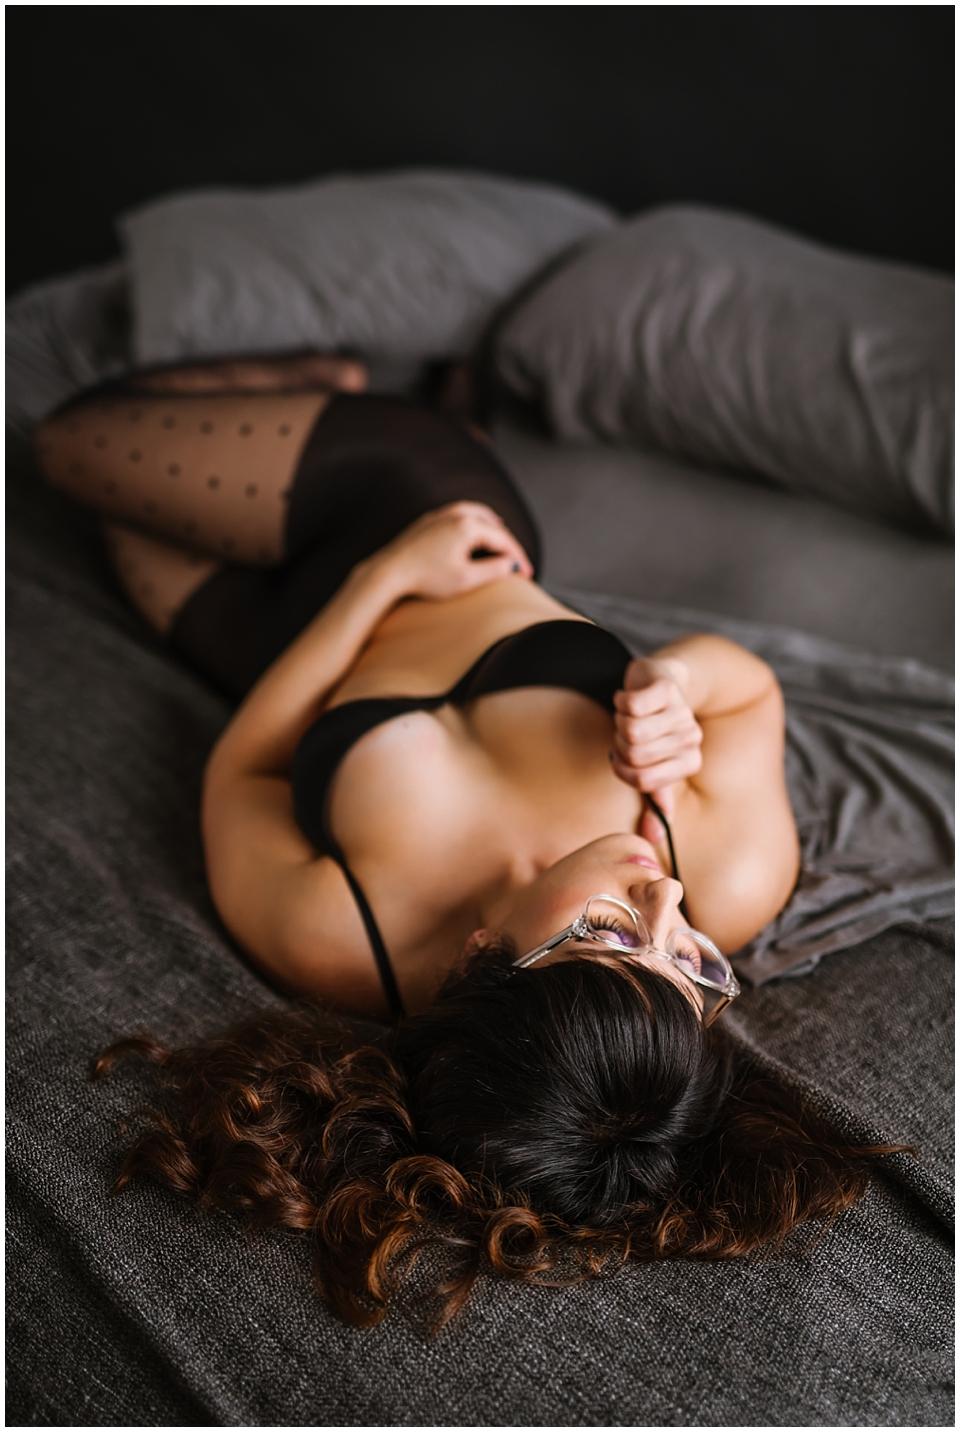 offbeat-boudoir-tampa-photography-studio-4.jpg